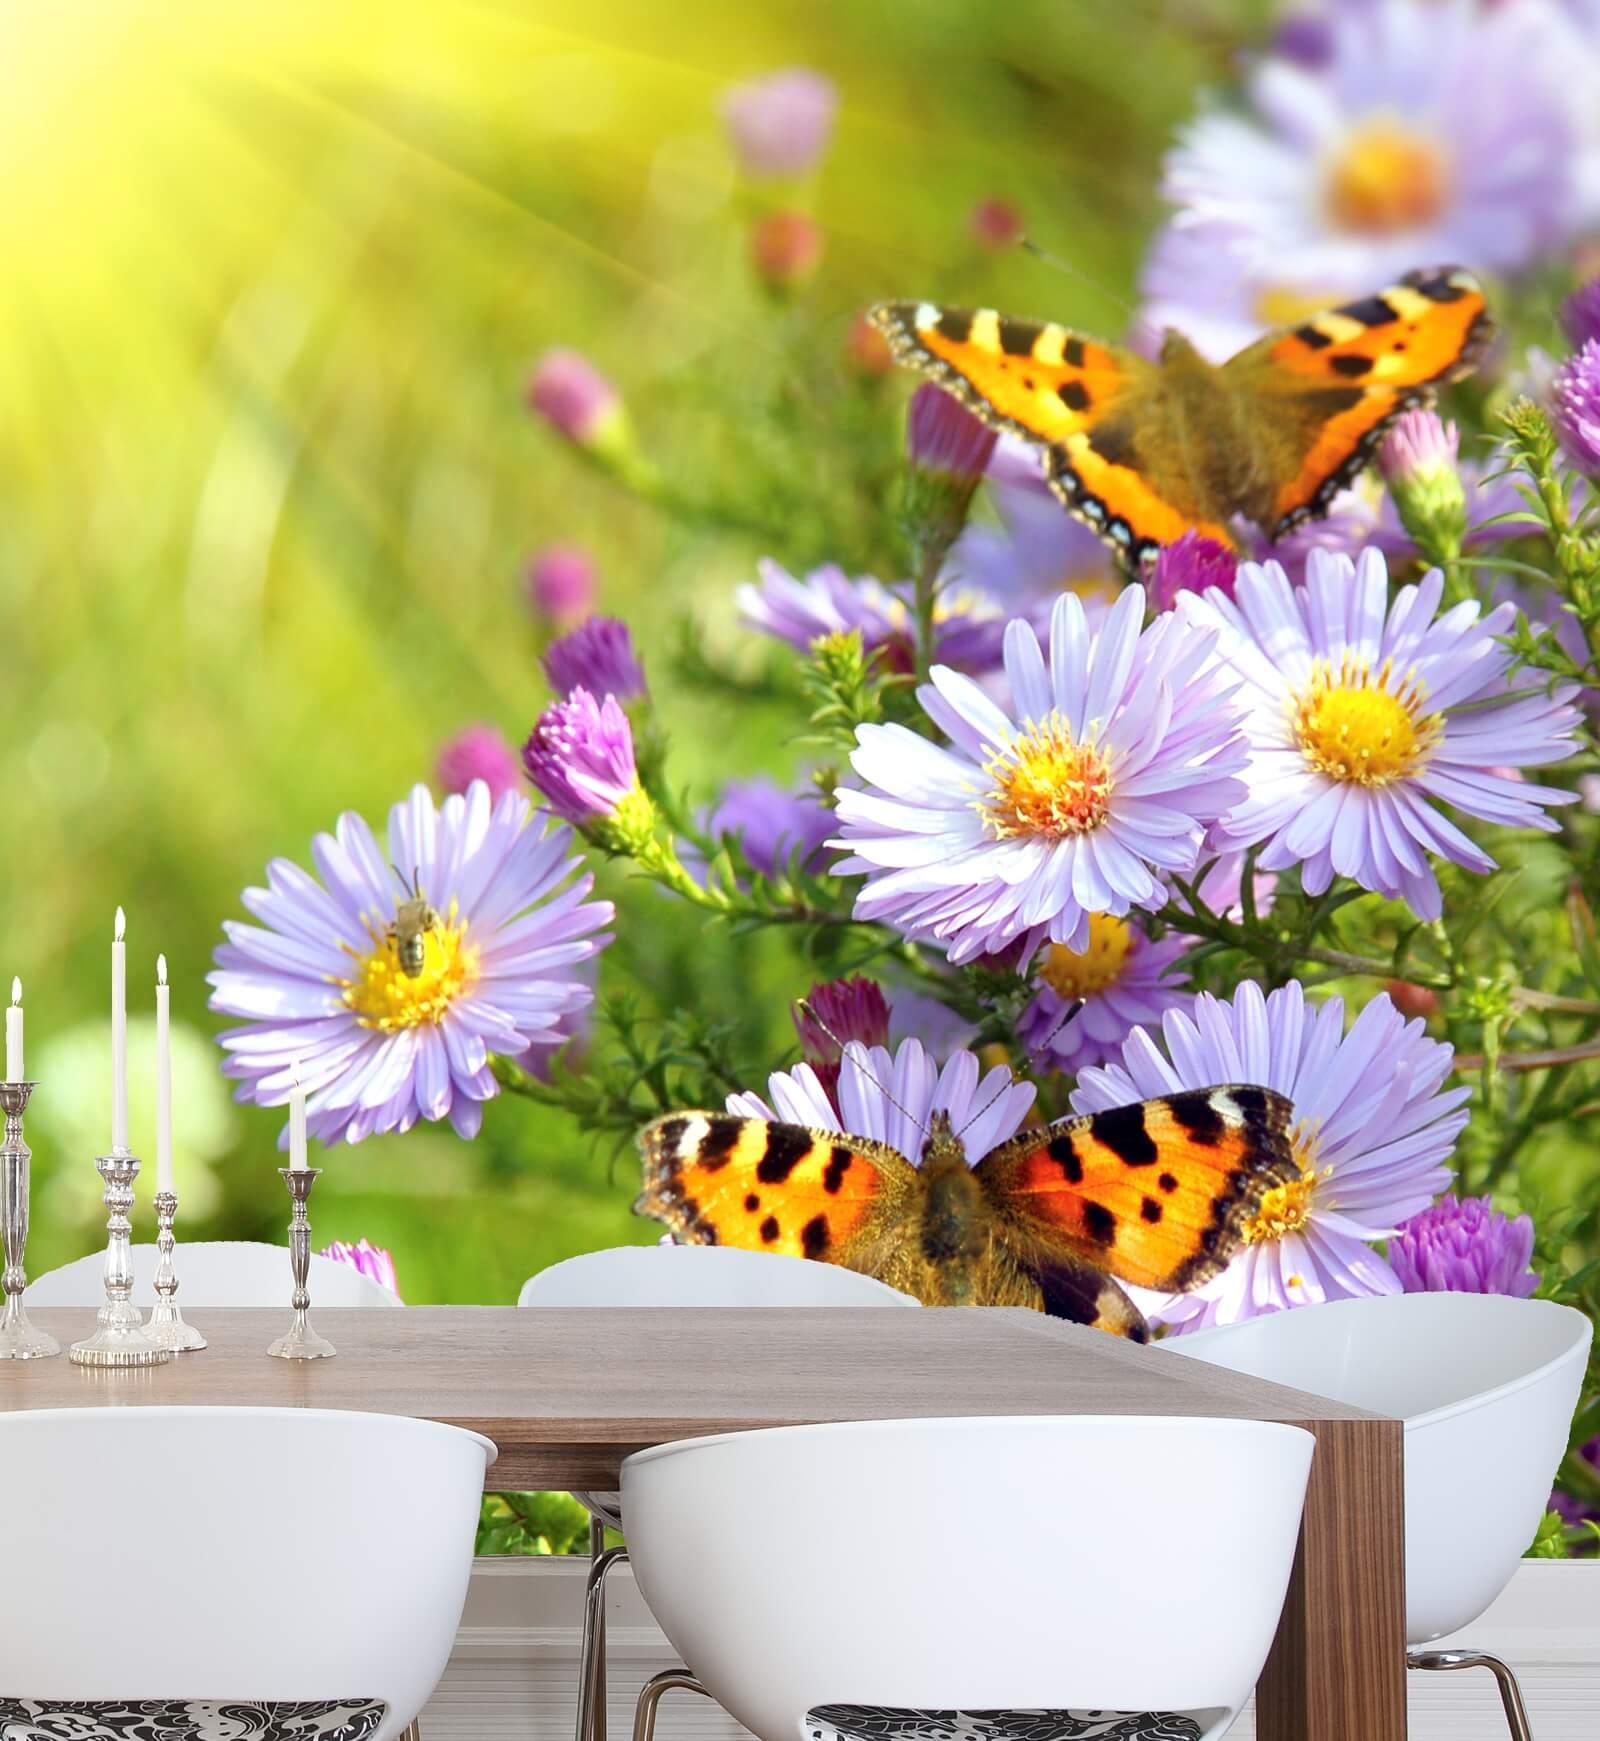 Vlies Xxl Poster Fototapete Natur Blumen Schmetterlinge Natur